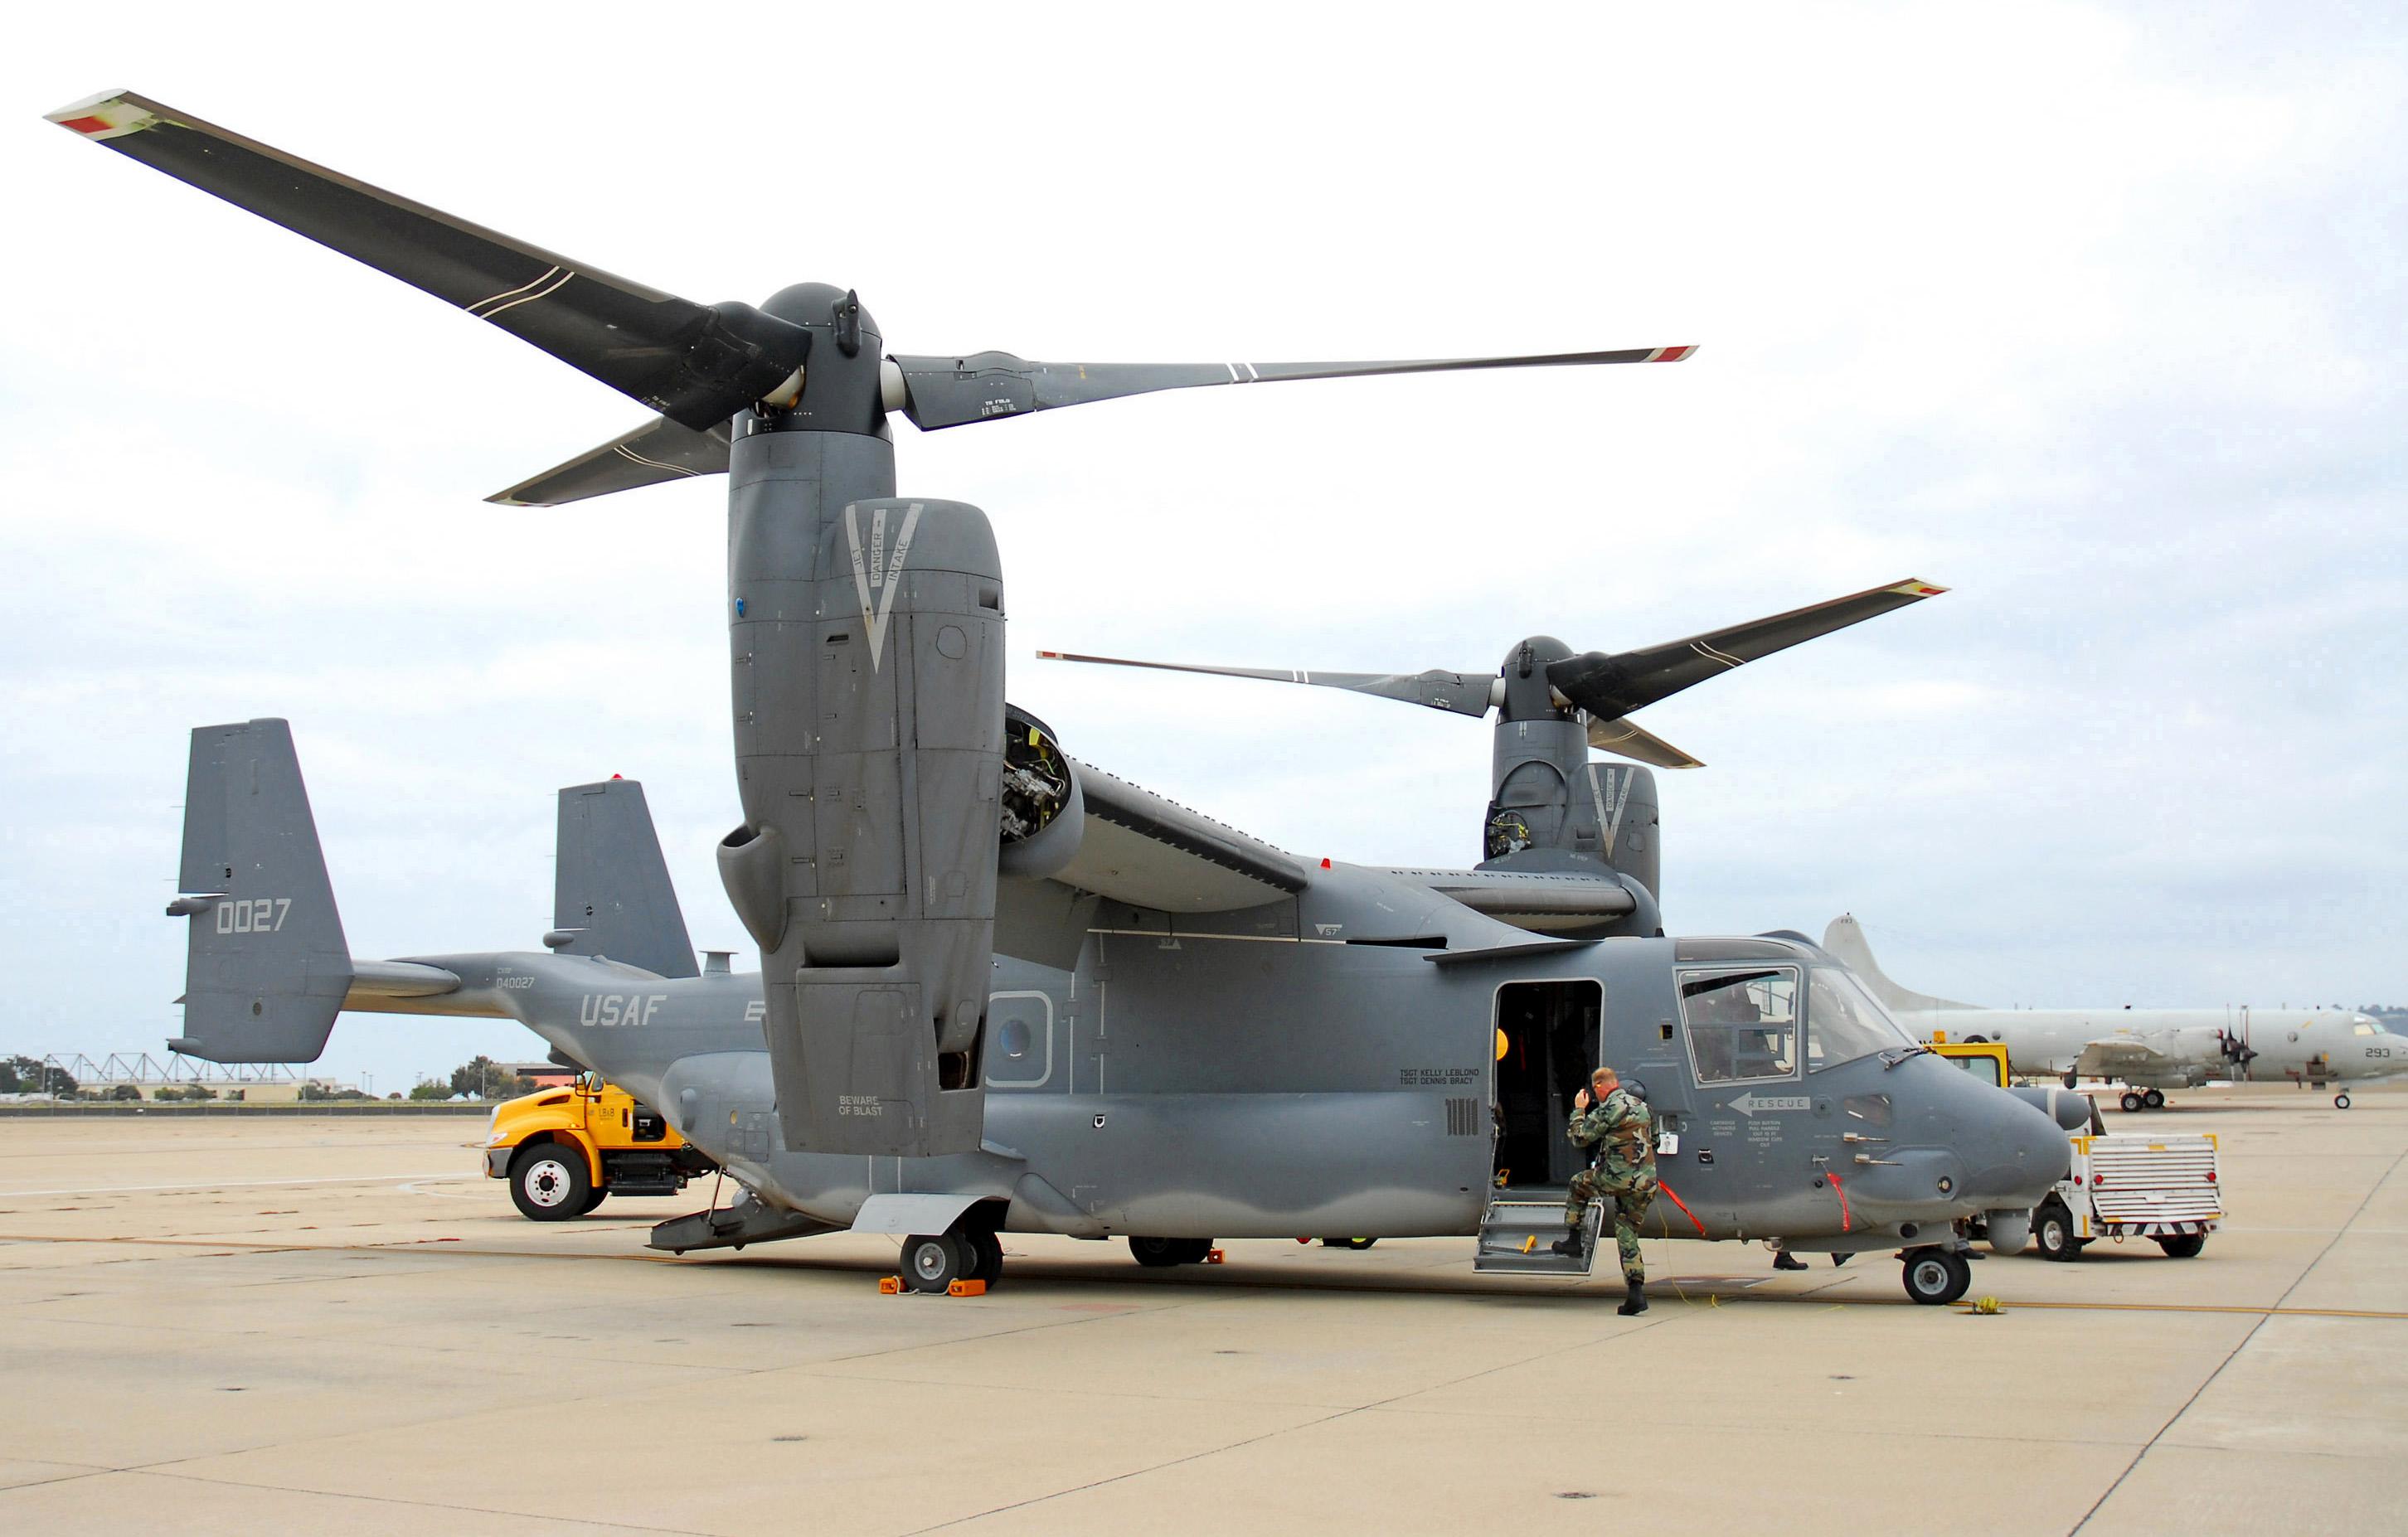 Osprey Elicottero : File v osprey sideview g wikimedia commons